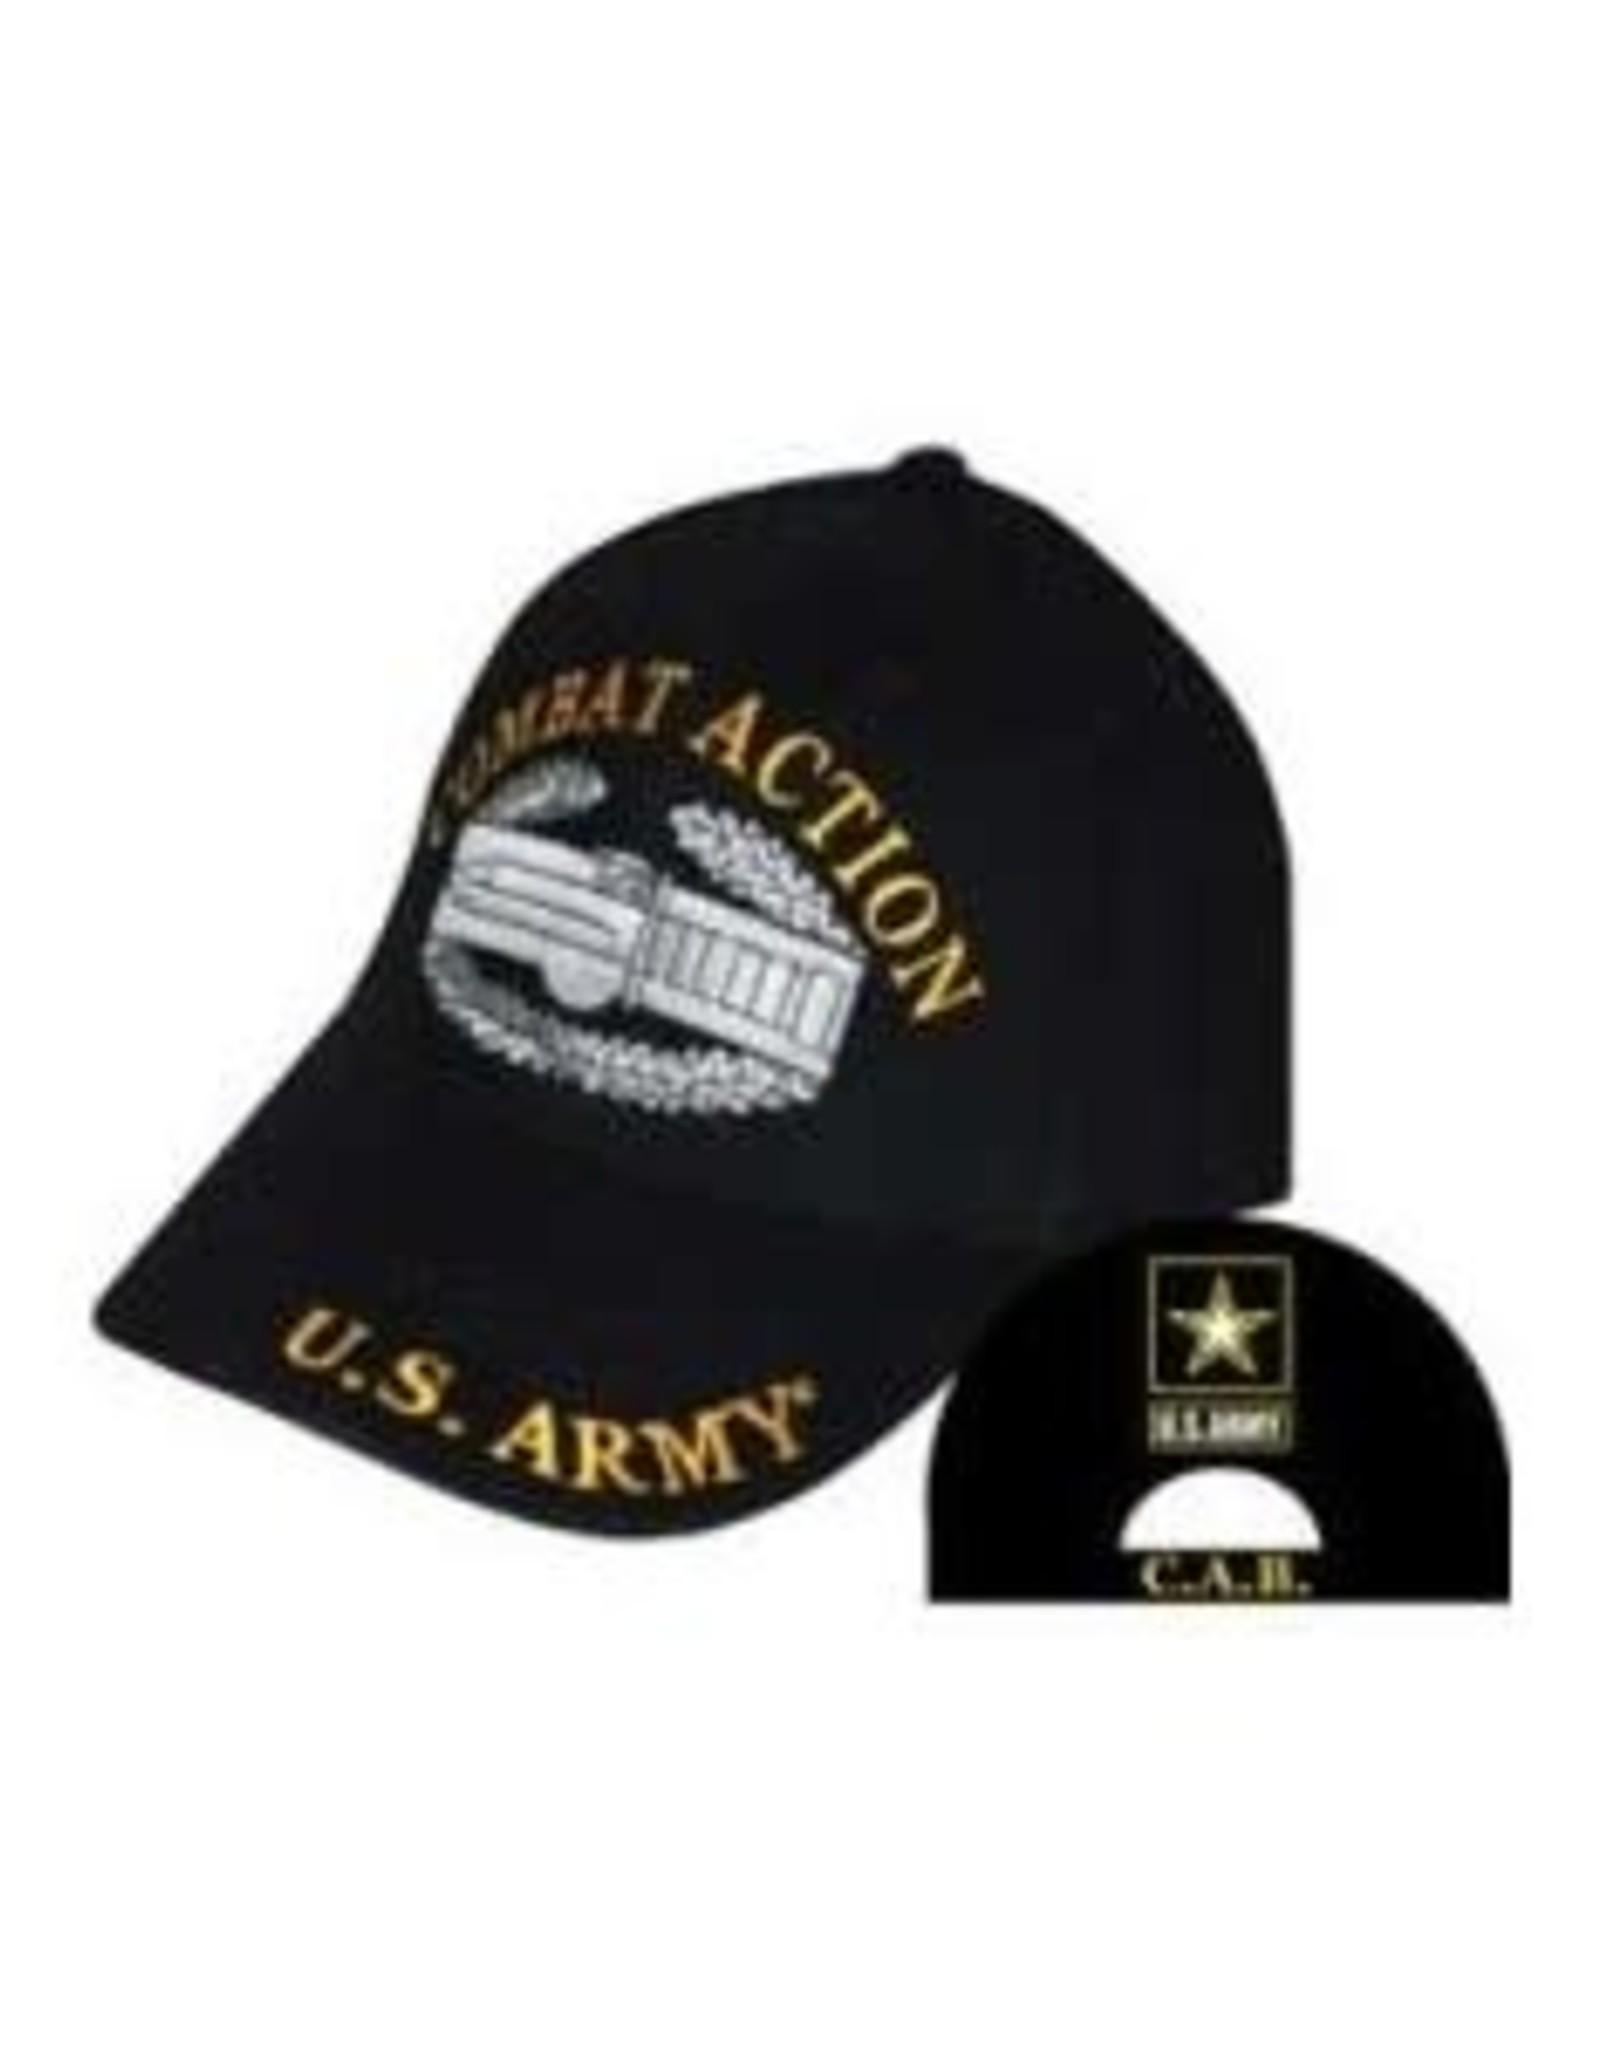 MidMil Army Combat Action Hat with Emblem Black